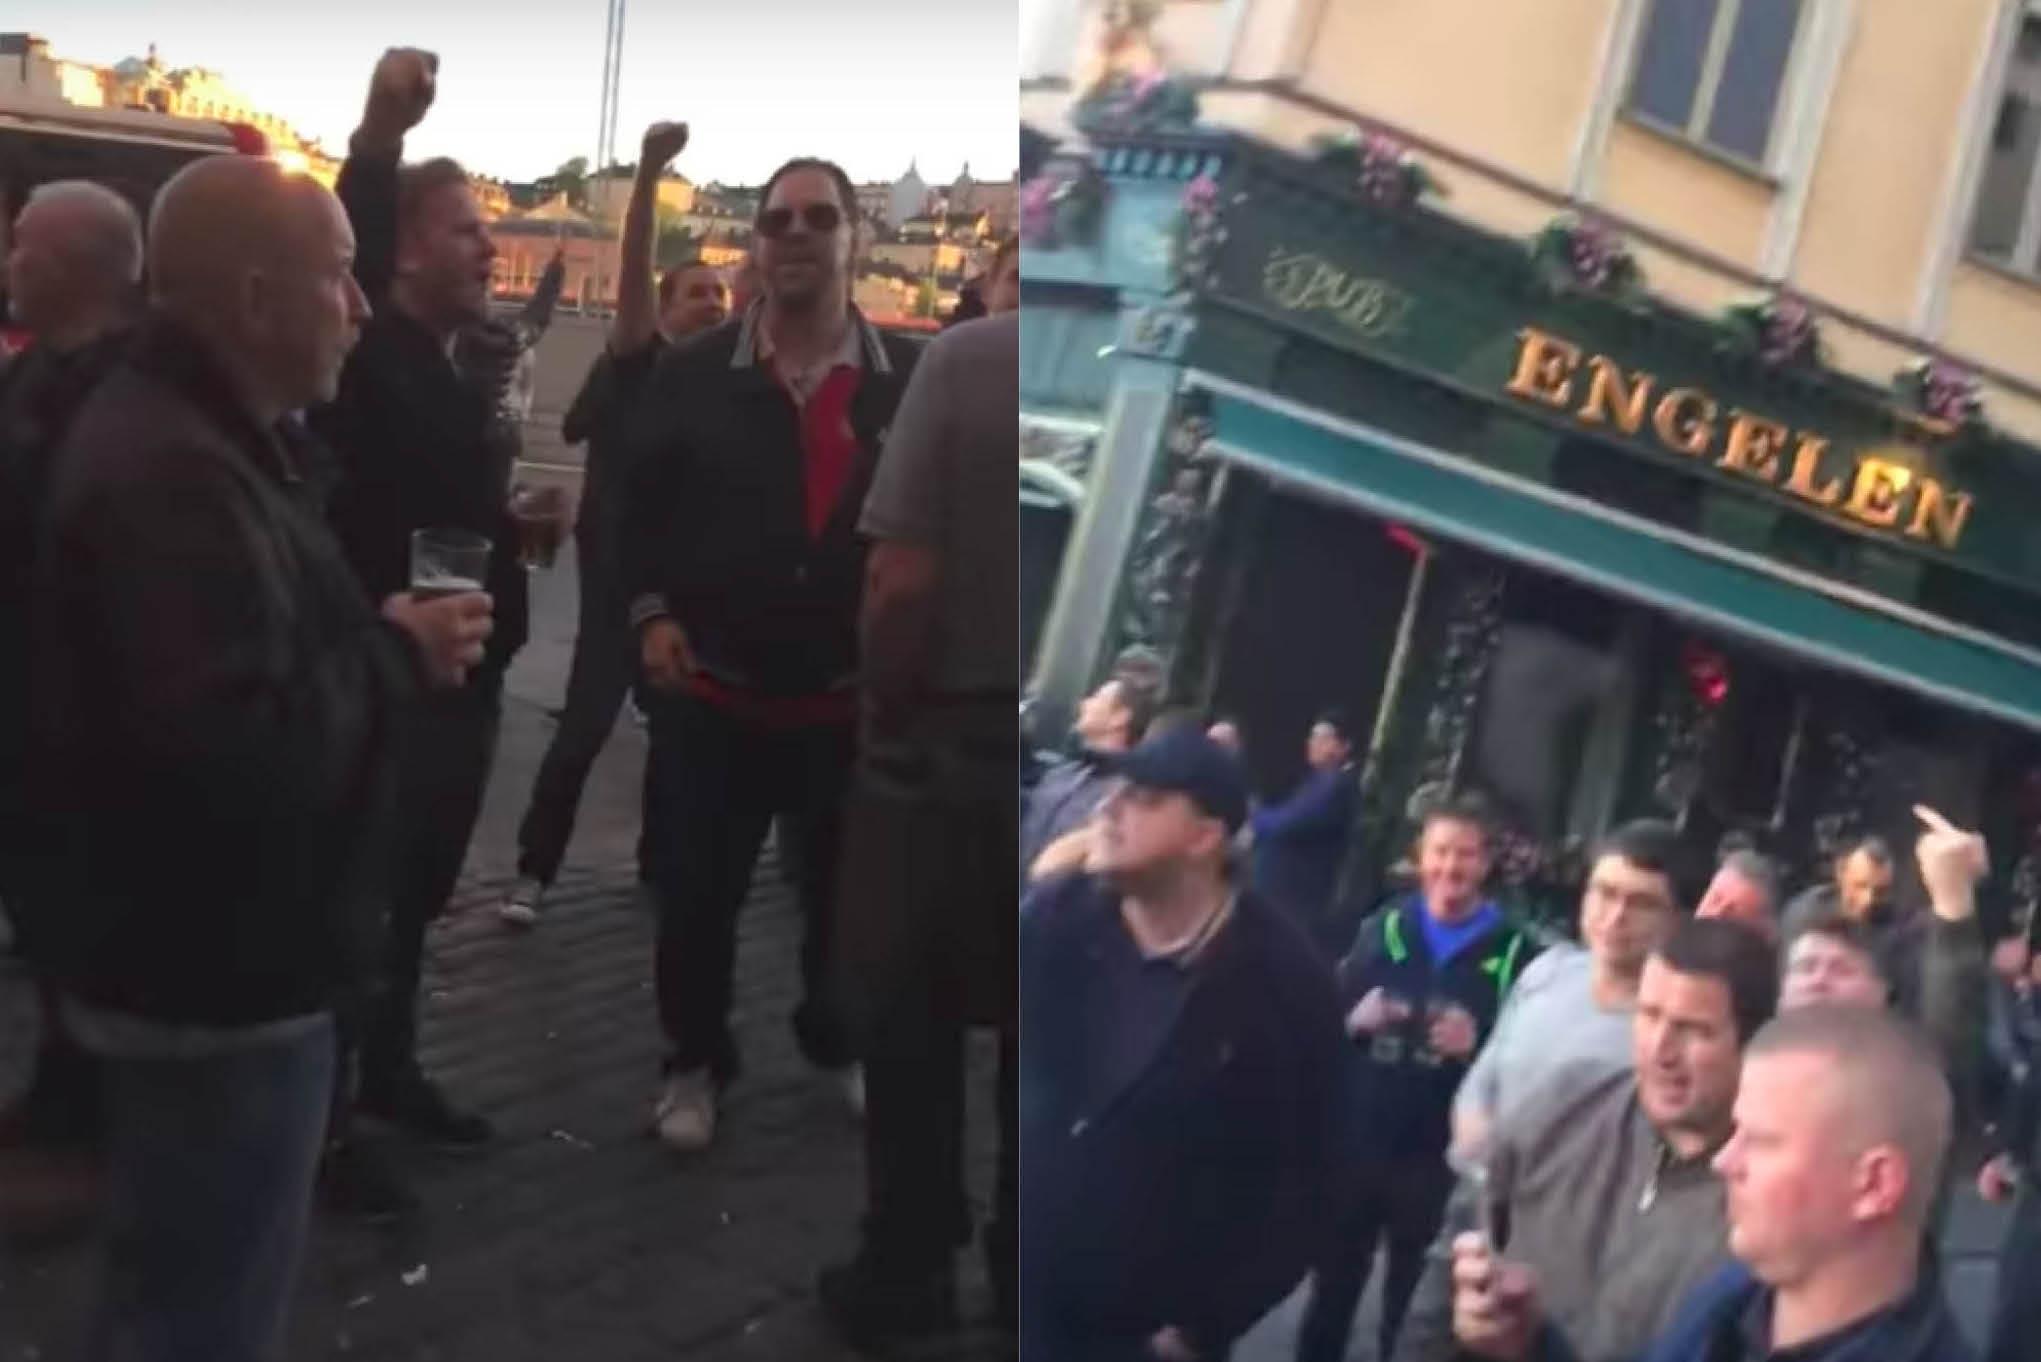 Manchester chant